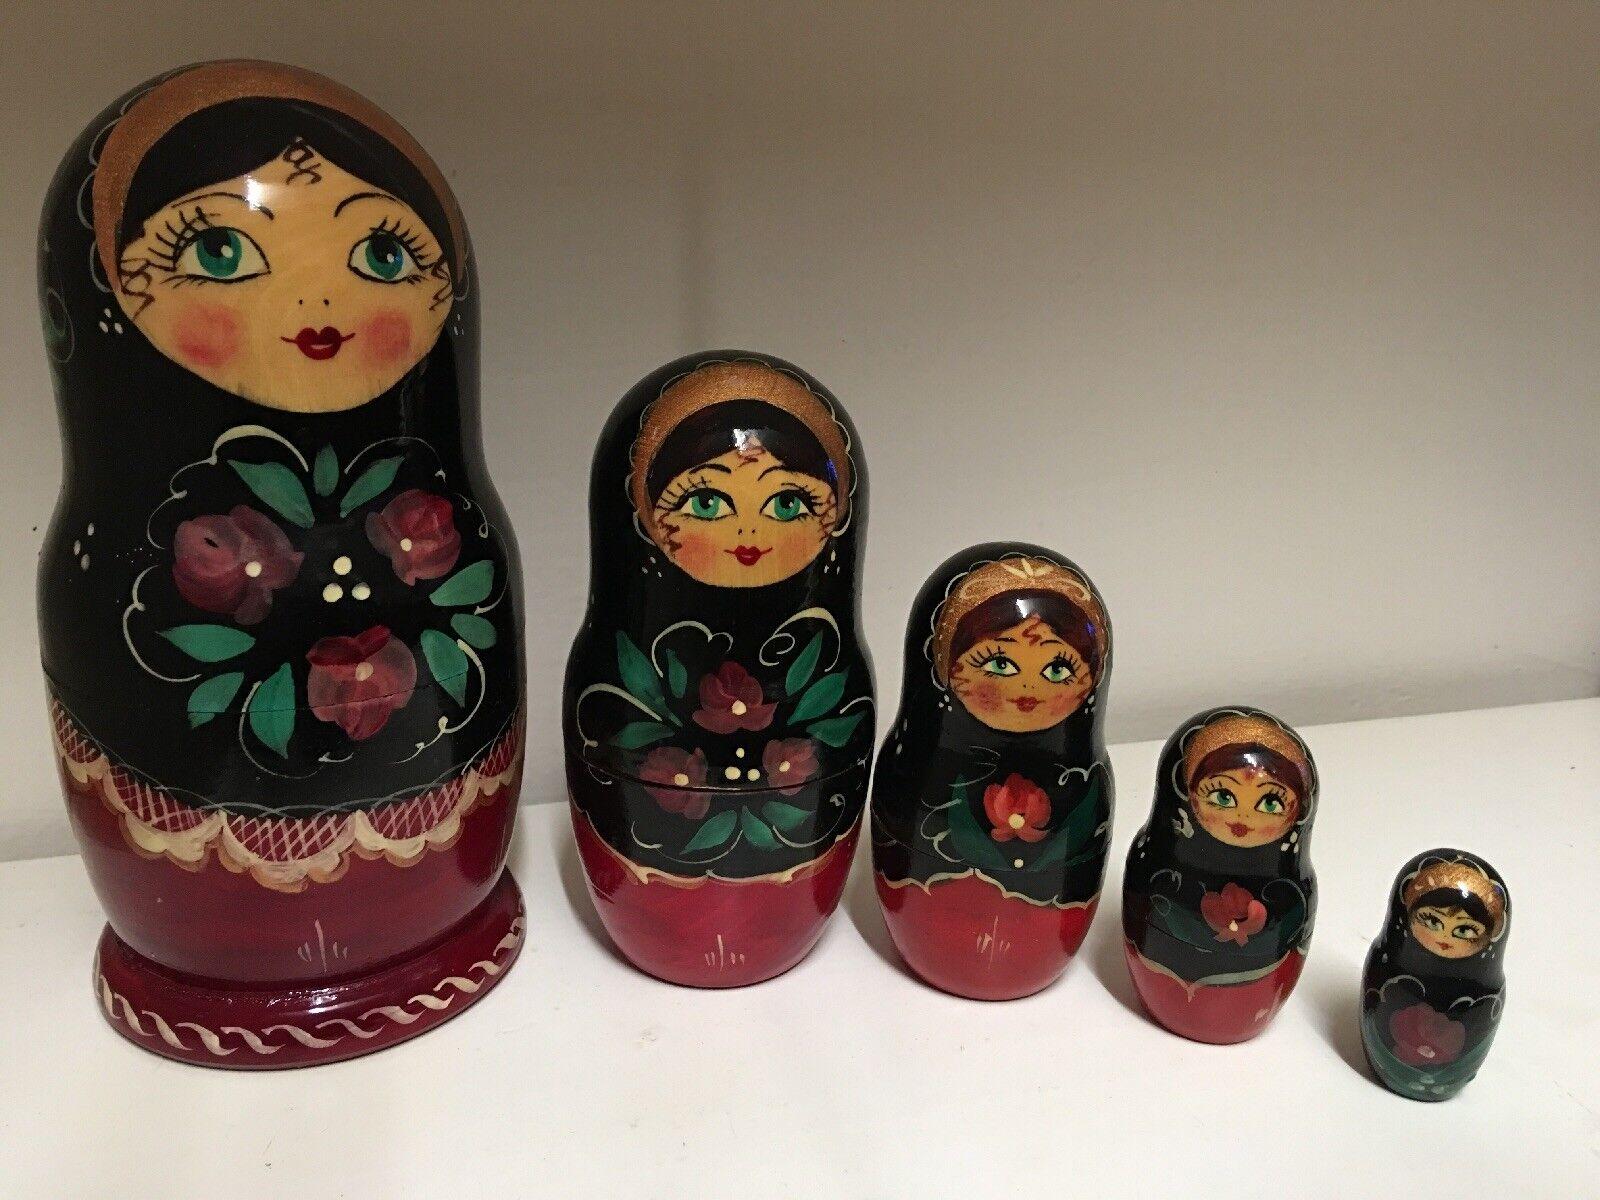 Russian Nesting Dolls Matryoshka 5 Pcs Signed by Artist 7  tall NEW